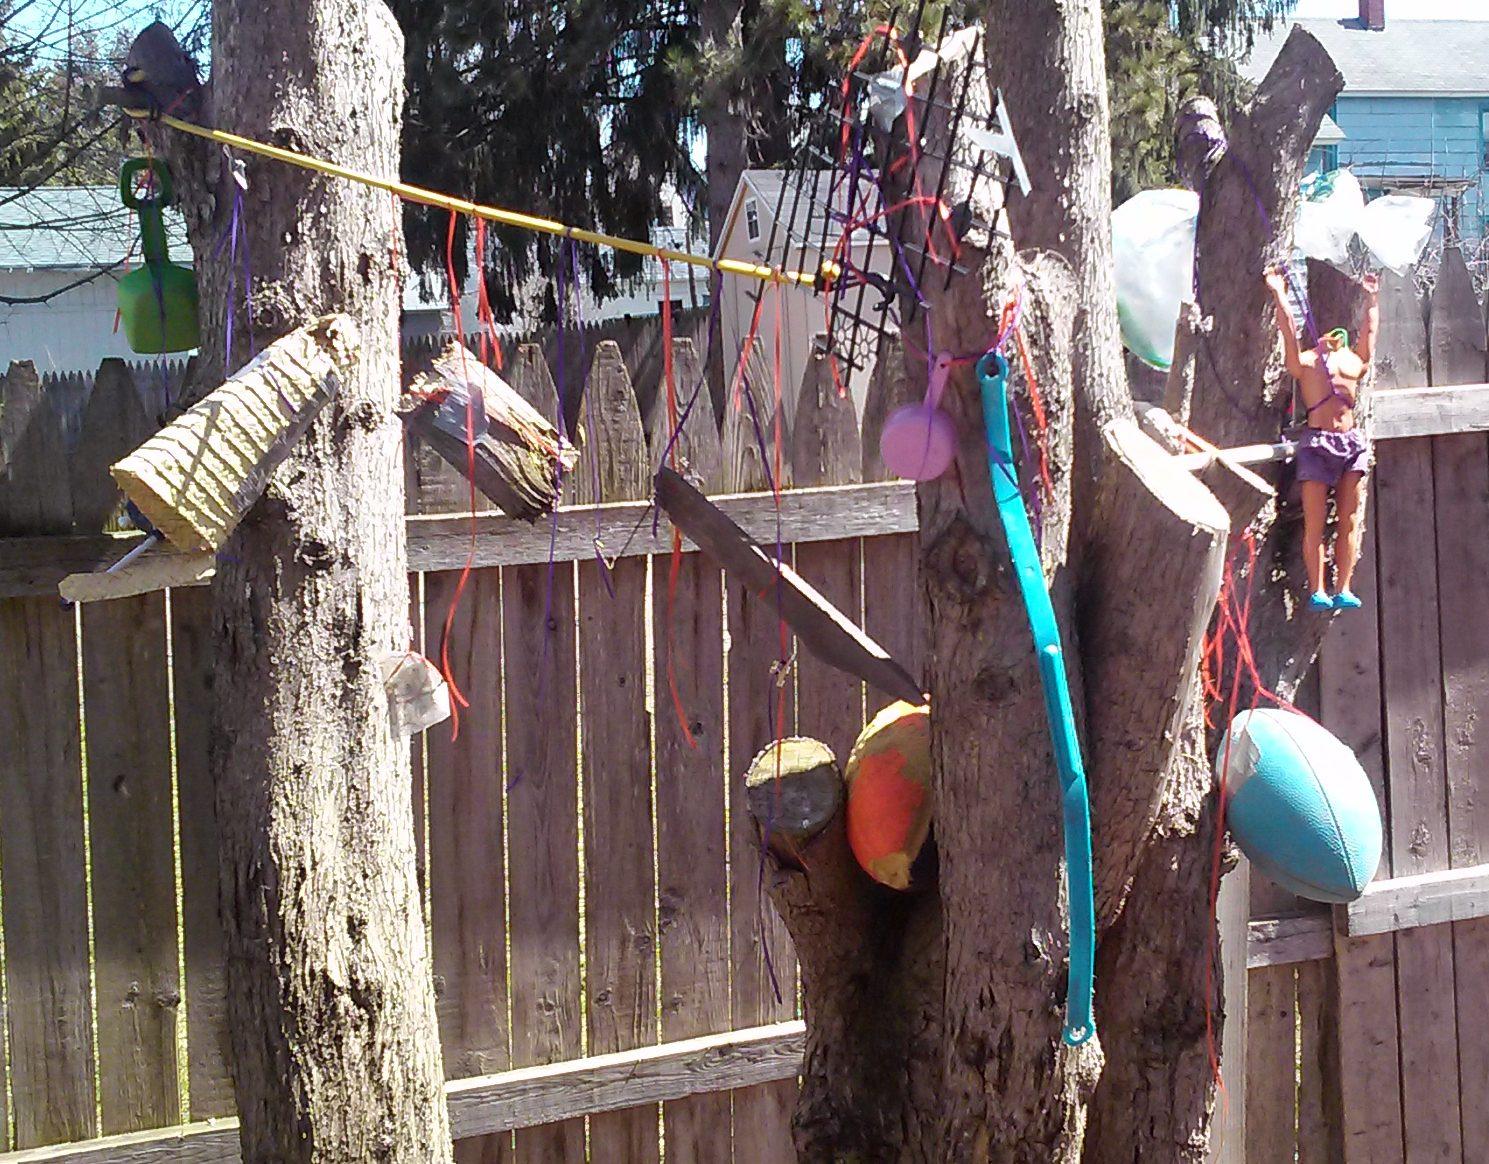 The Herkimer Junk Tree